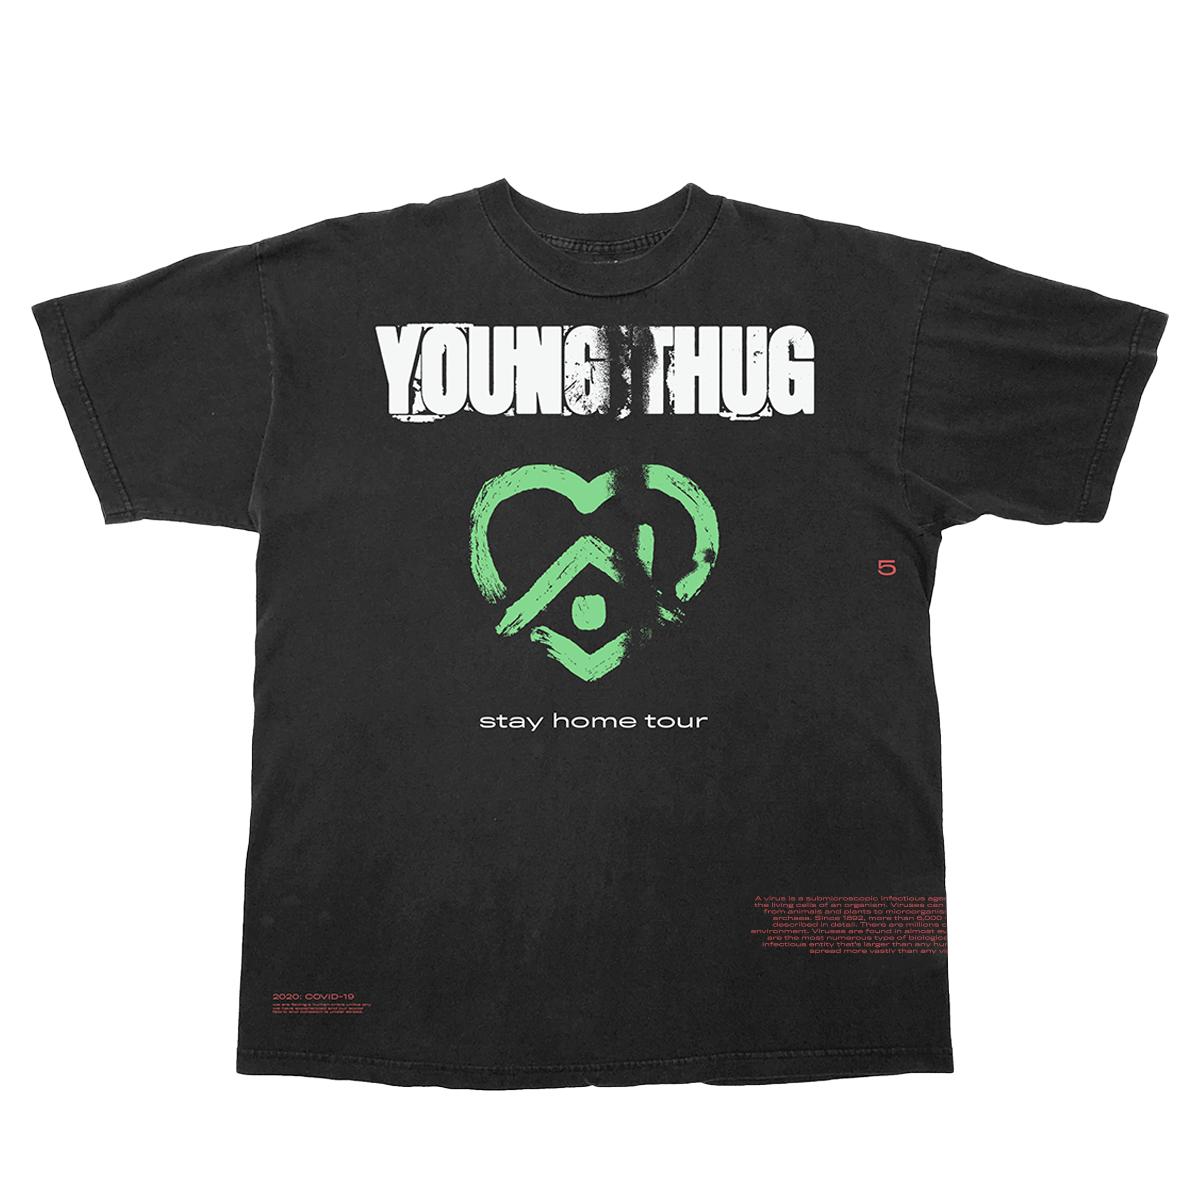 2020 Stay Home Tour Black & Green T-Shirt